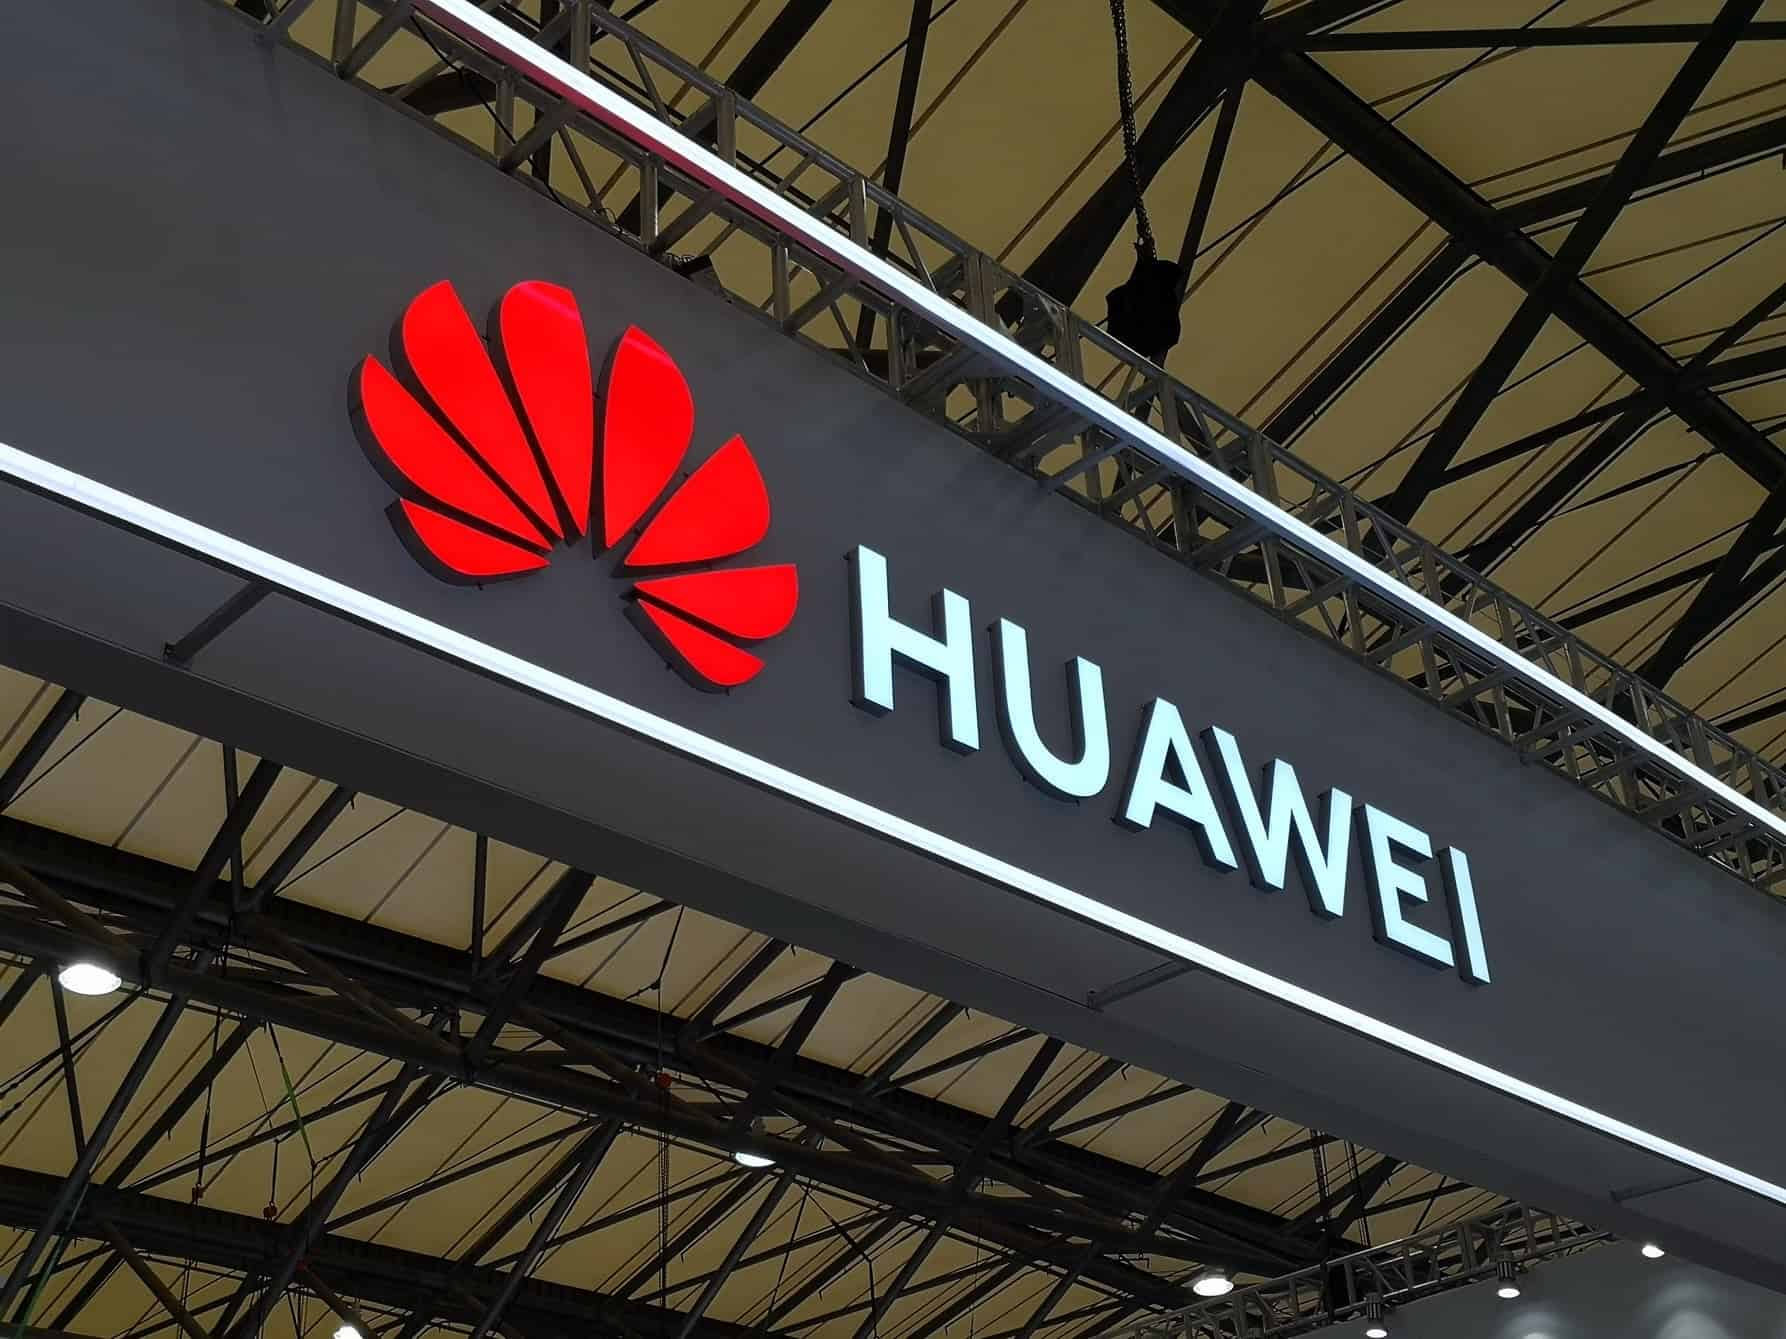 Huawei geçici genel lisans